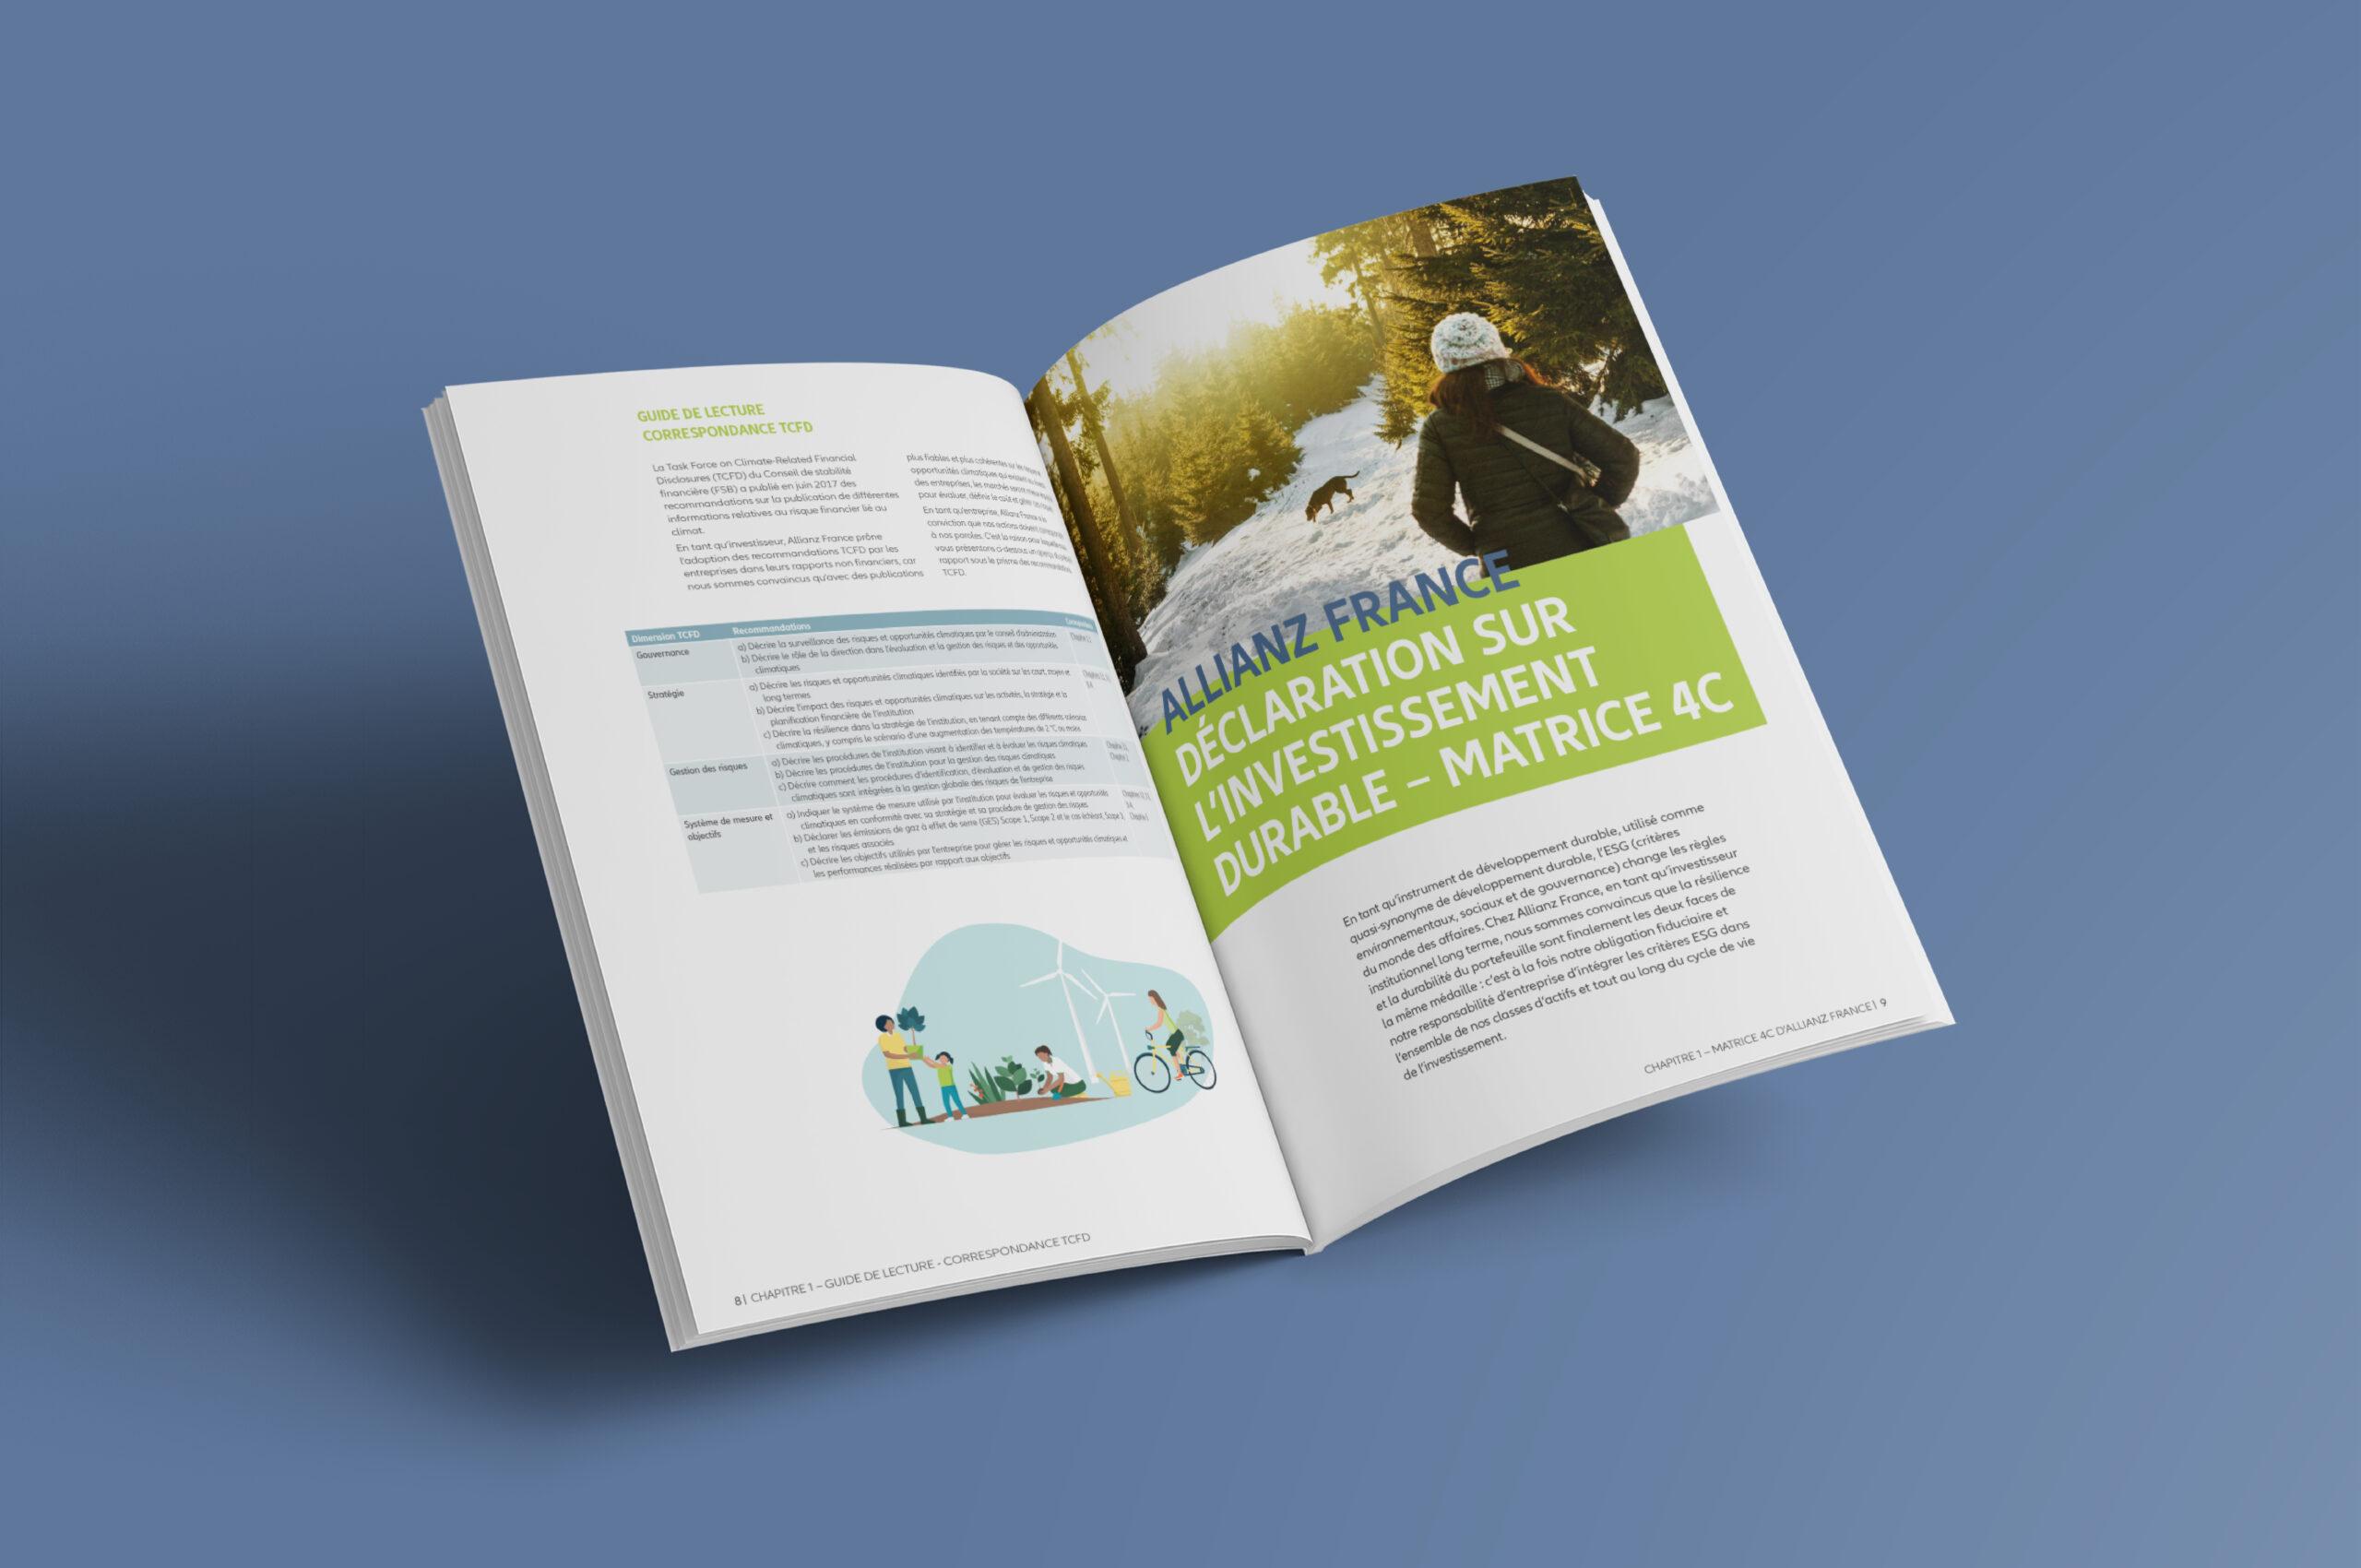 Rapport investissement durable allianz 2